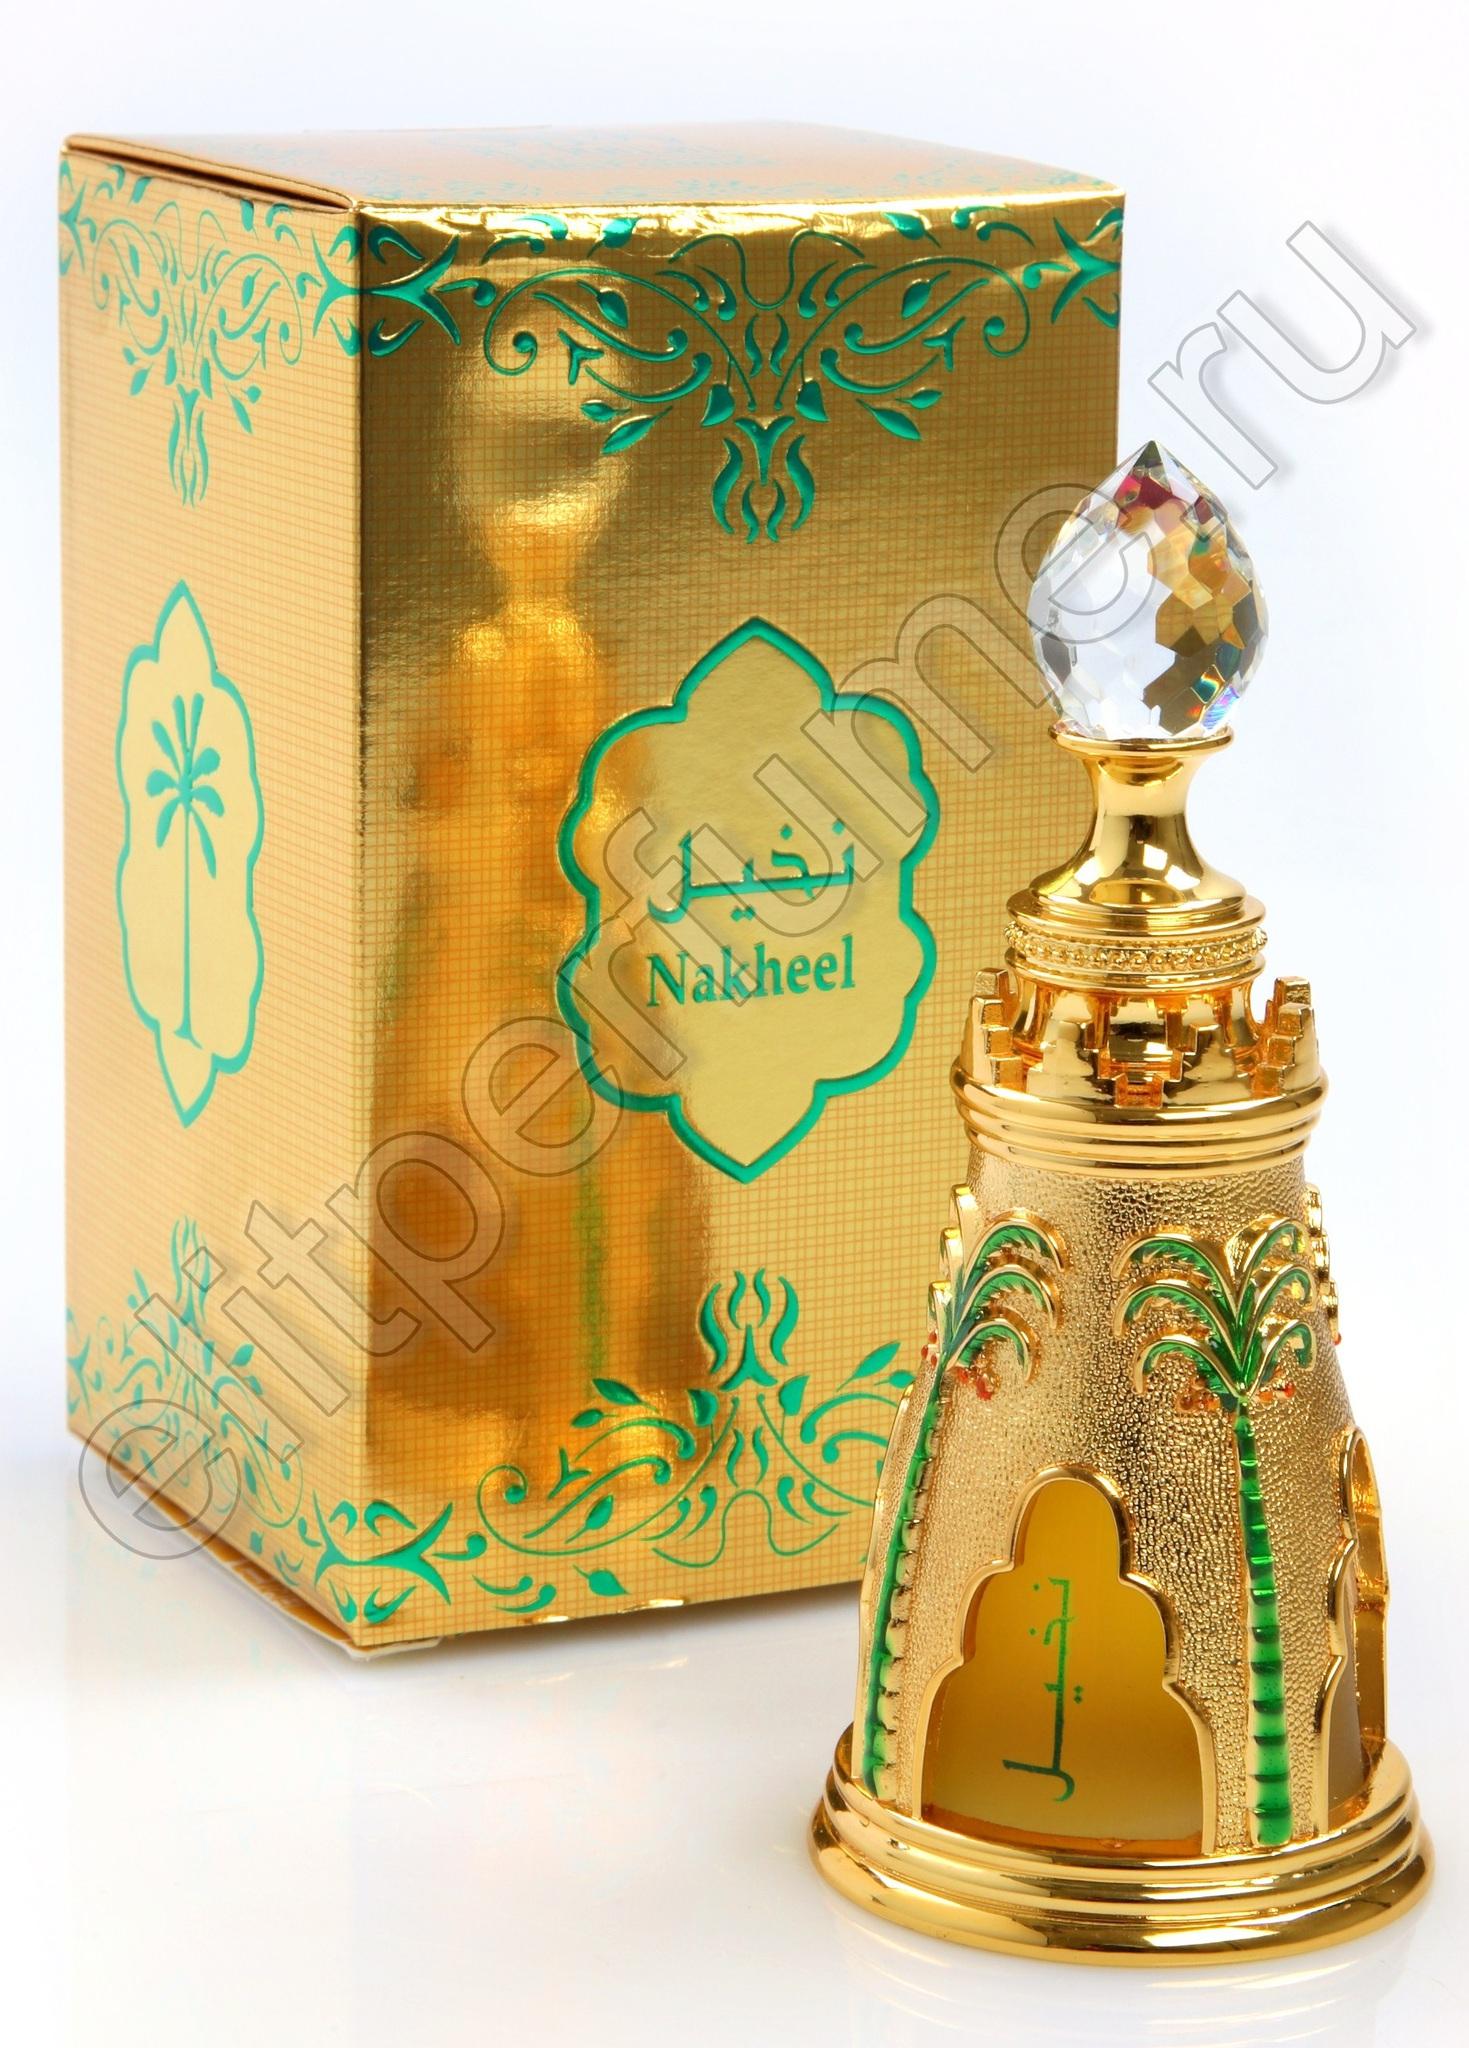 Пробники для духов Нахиль Nakheel 1 мл арабские масляные духи от Аль Харамайн Al Haramin Perfumes